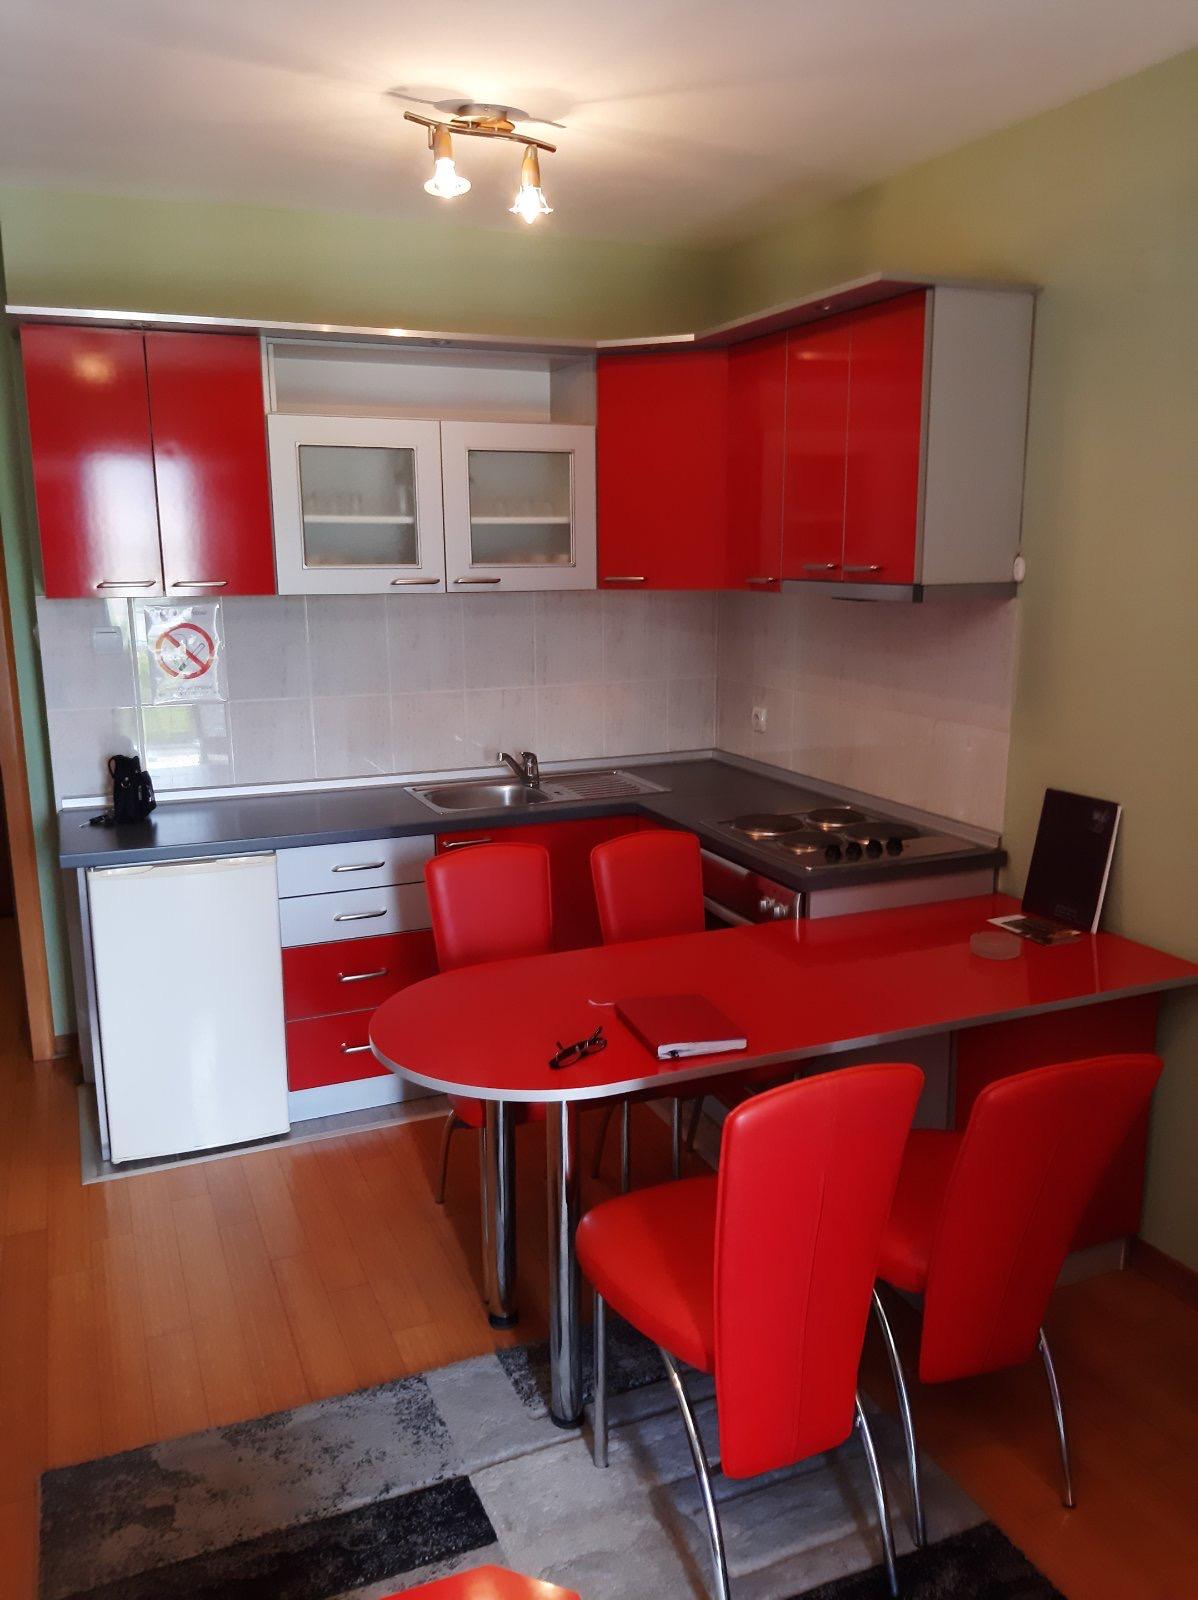 Exstra-apartman 41 m2, namešten, garaža, Vrnjačka Banja